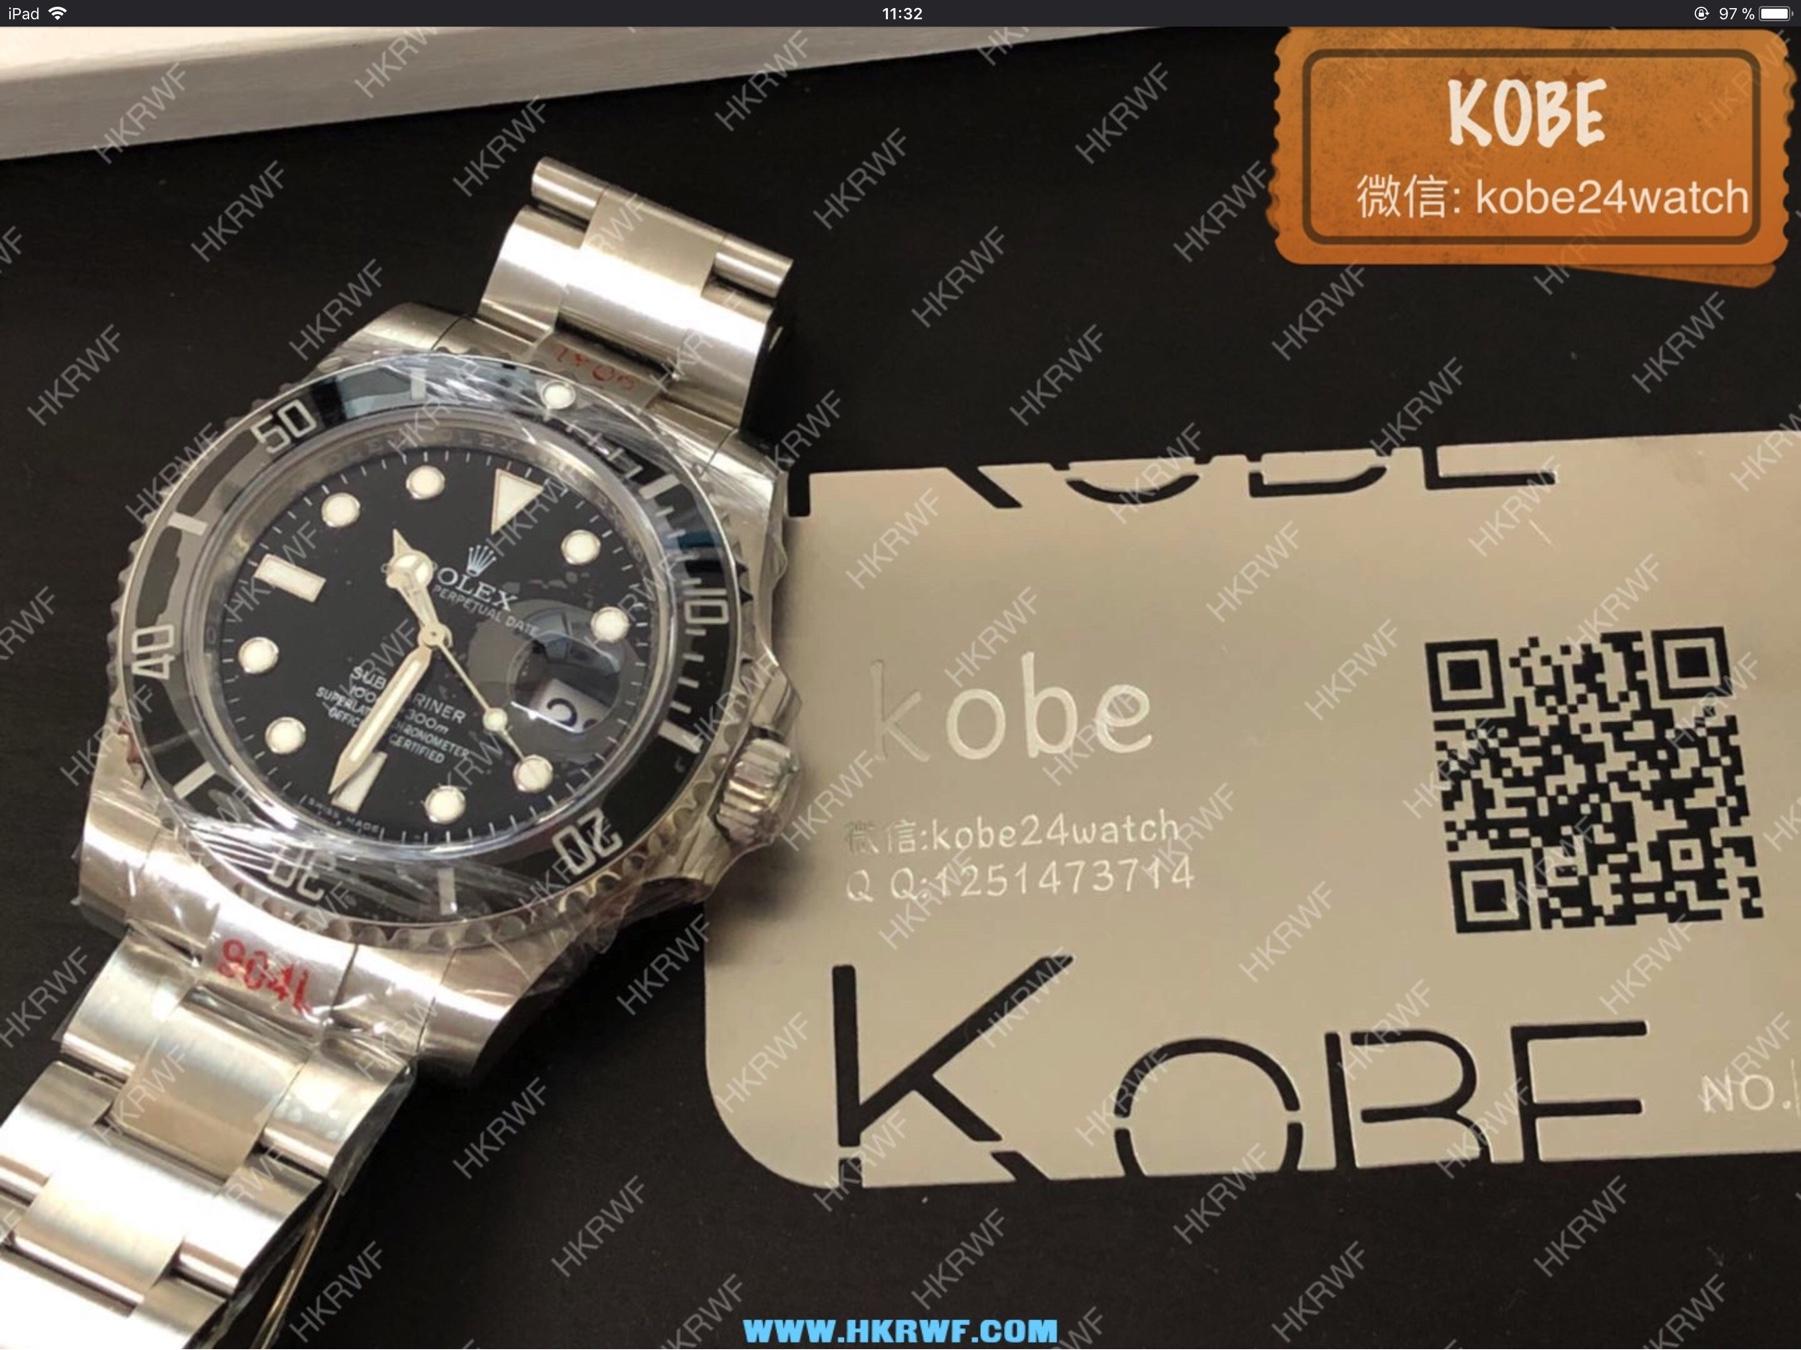 😍 Noob v9 sa3135 | Rolex Replica Submariner from Noob Factory  2019